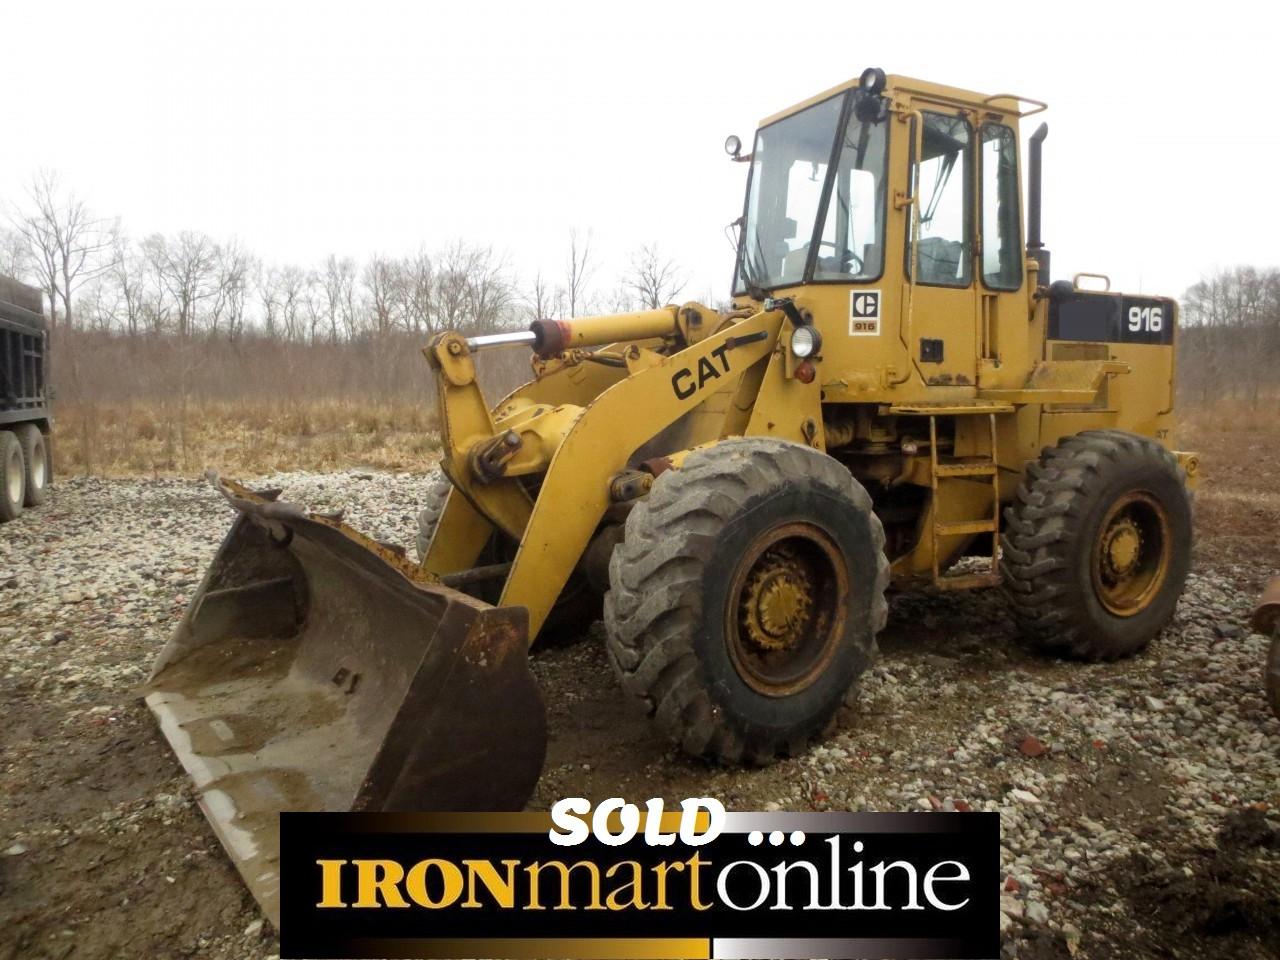 Cat 916 Wheel Loader used for sale